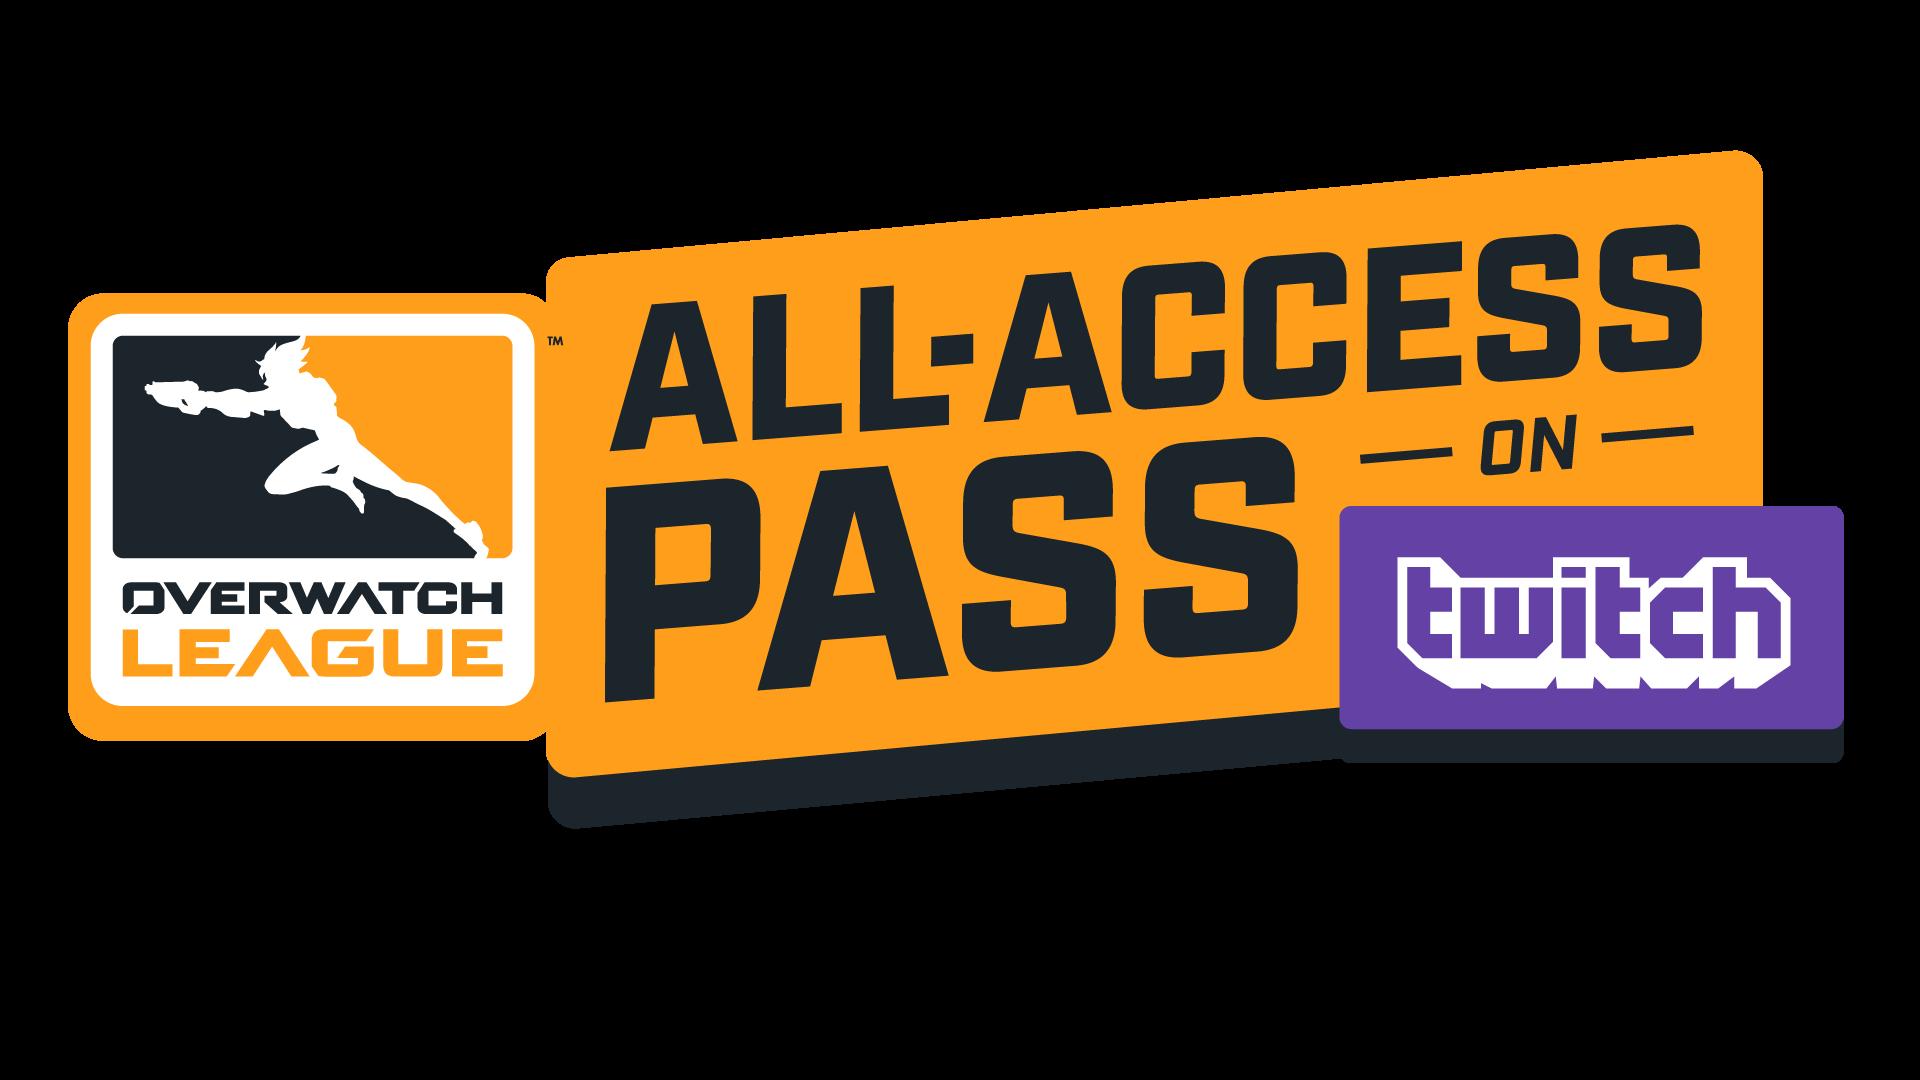 Overwatch League: Passe de Acesso Total já está disponível